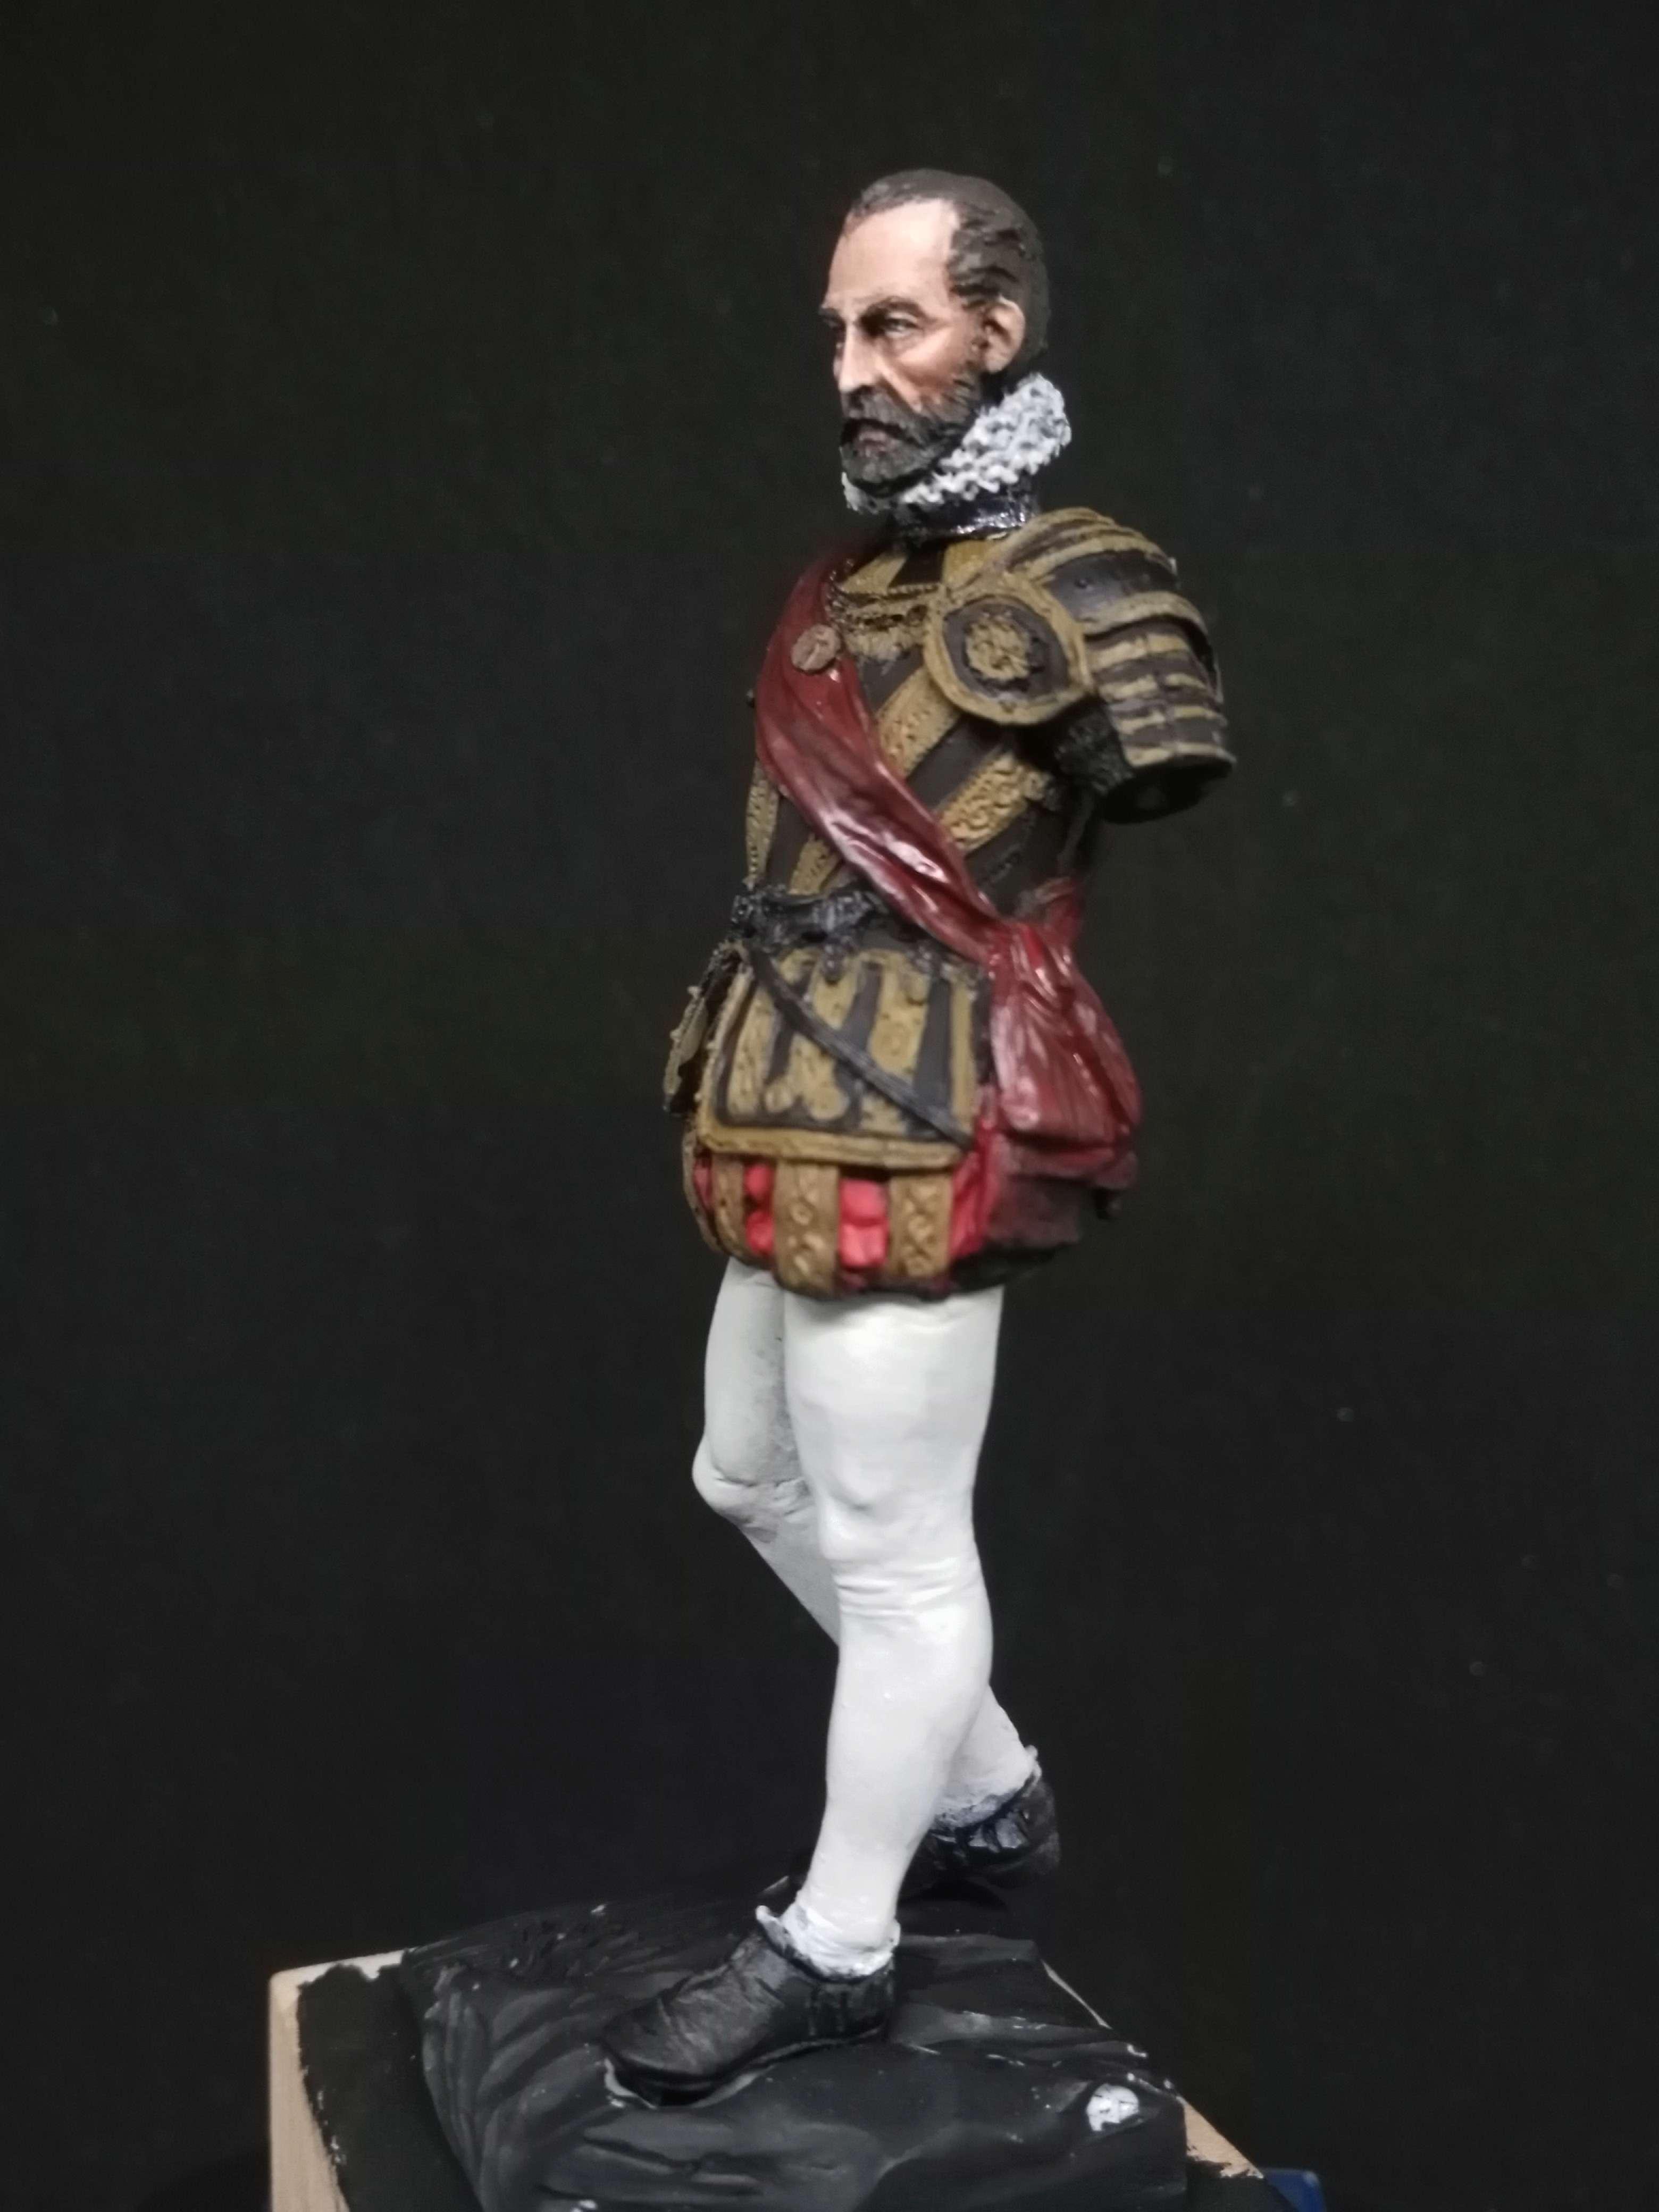 Don Alvaro de Bazan par Pisco Img_2179